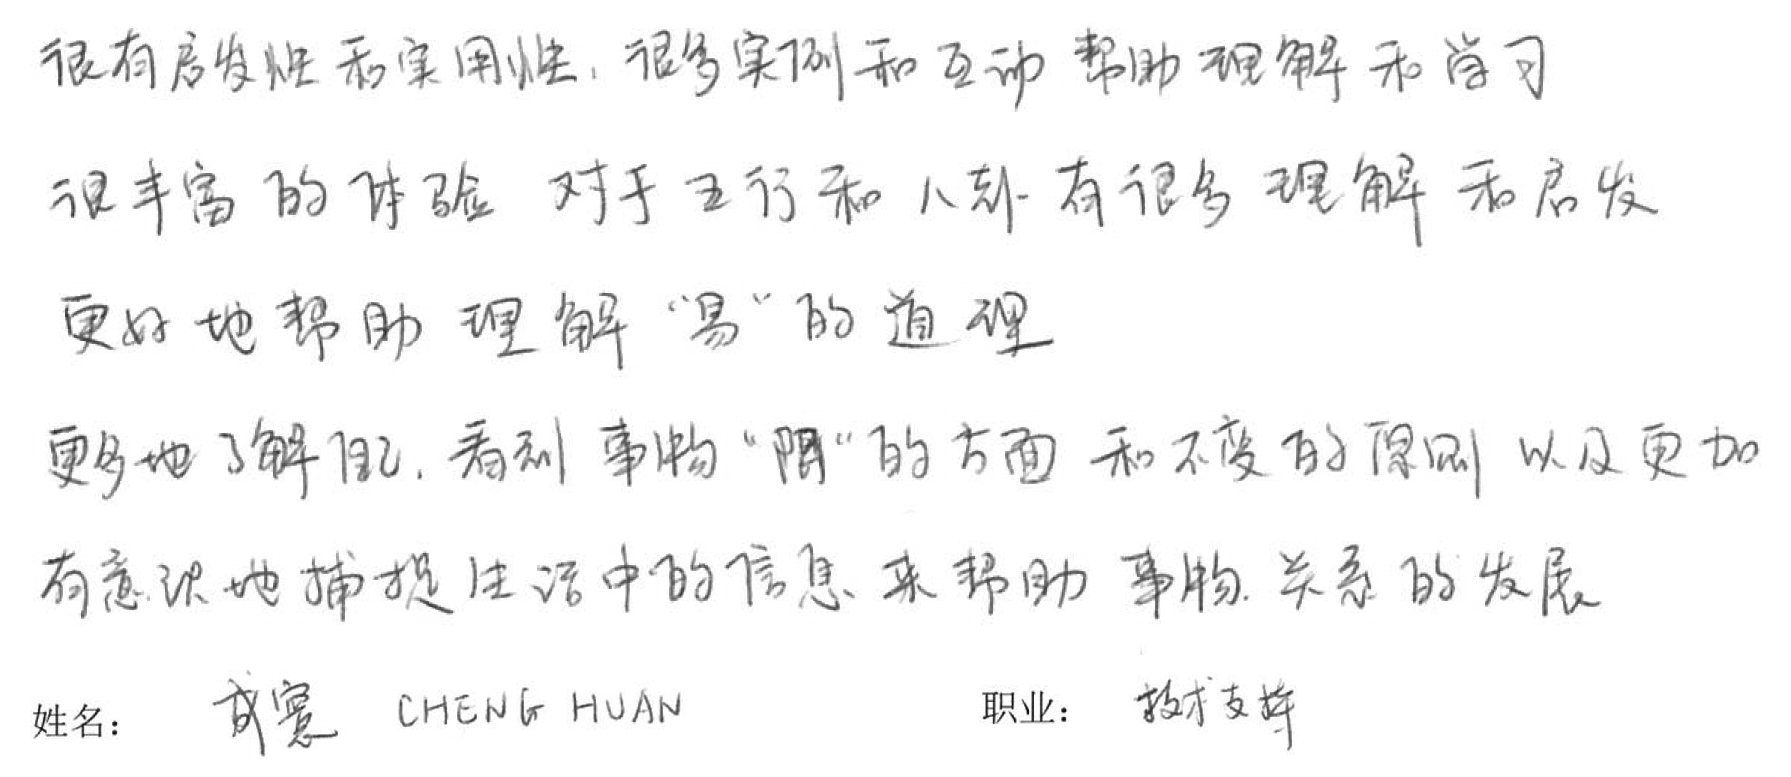 CHENG HUAN